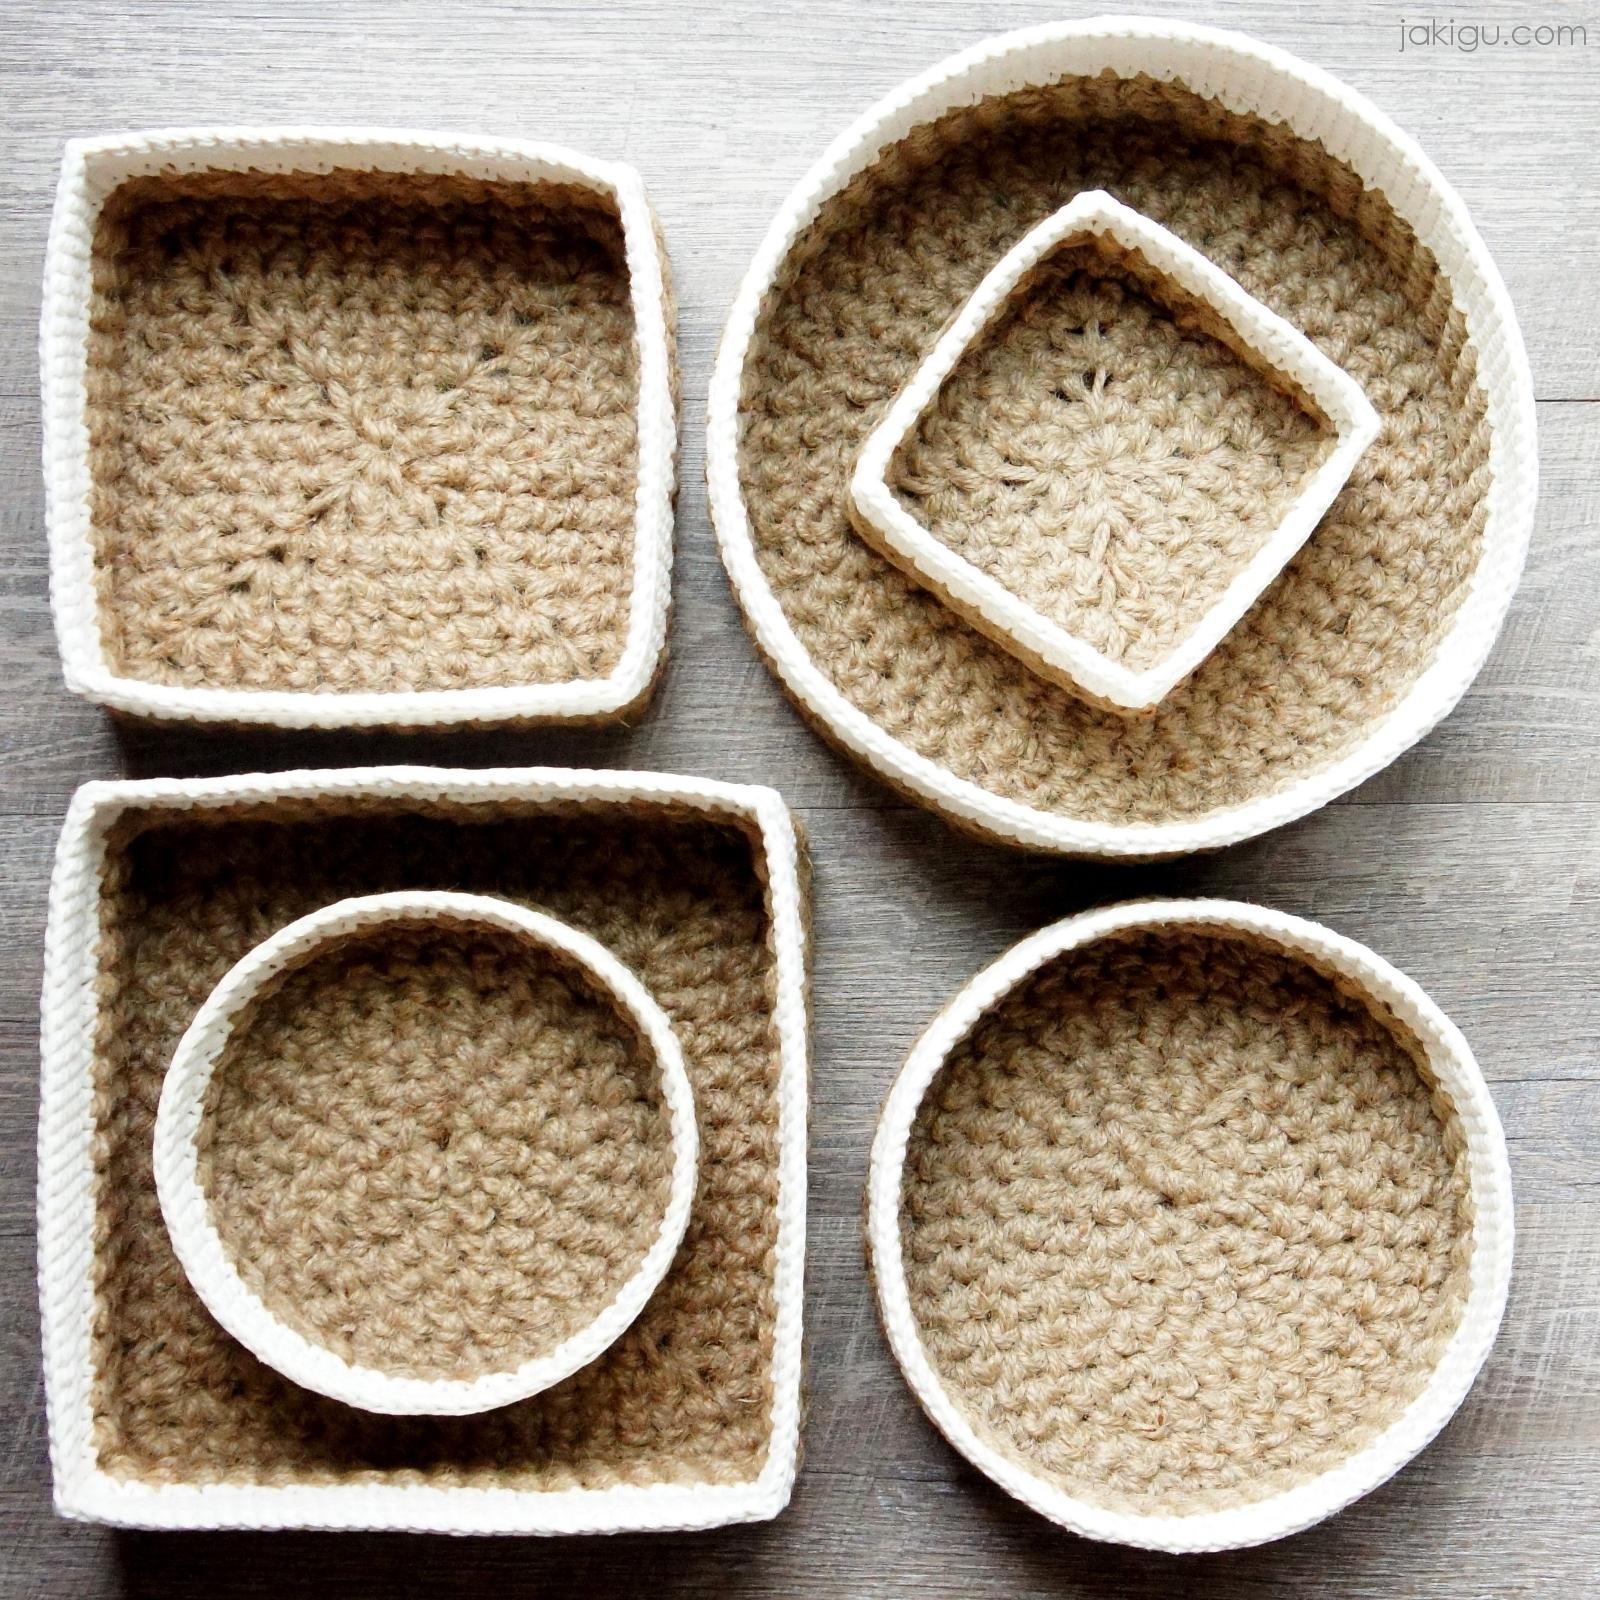 Crochet Pattern Bundle  Two jakigucom designs at a